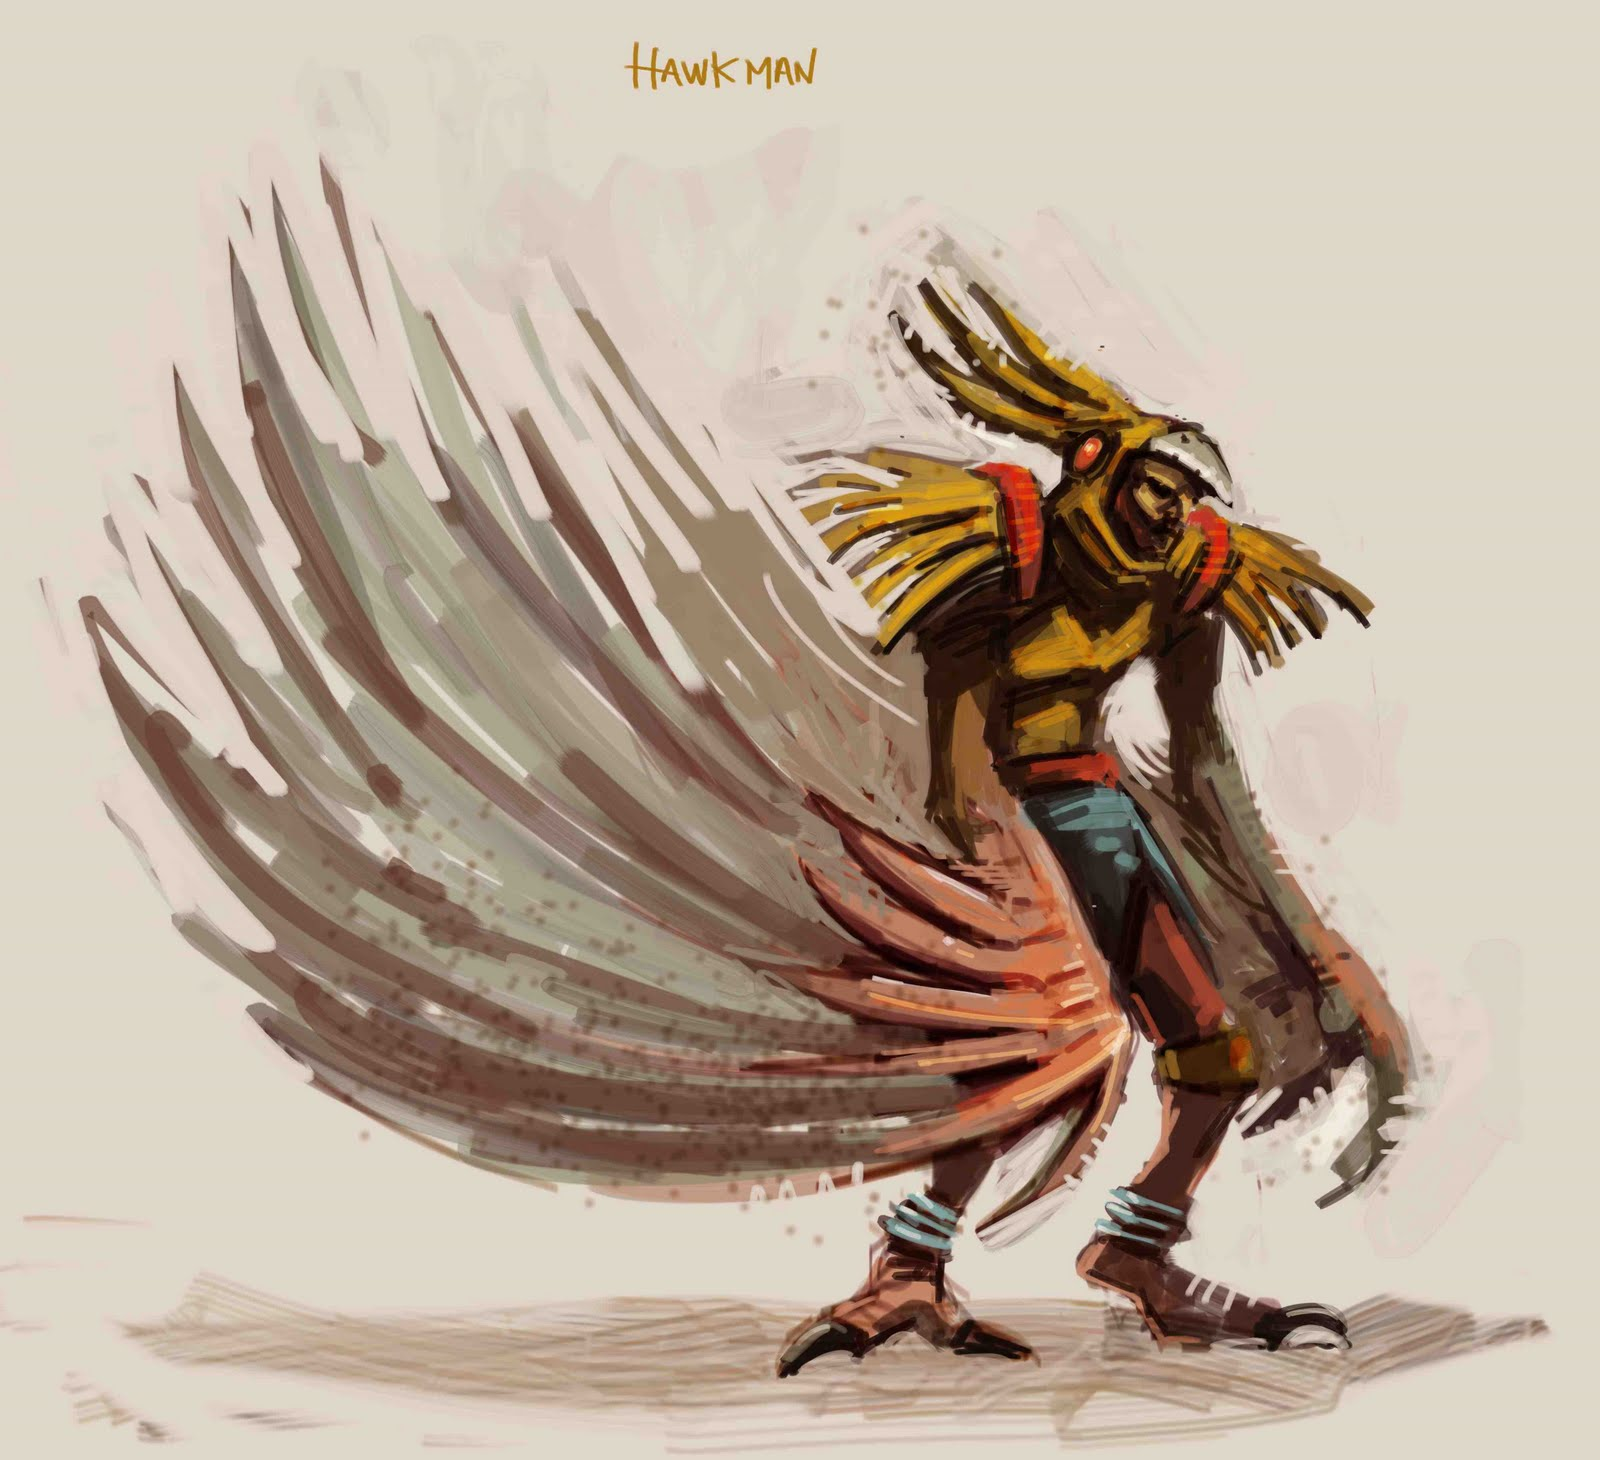 JuanBJuan Concept Art: hawk man. Flash Gordon